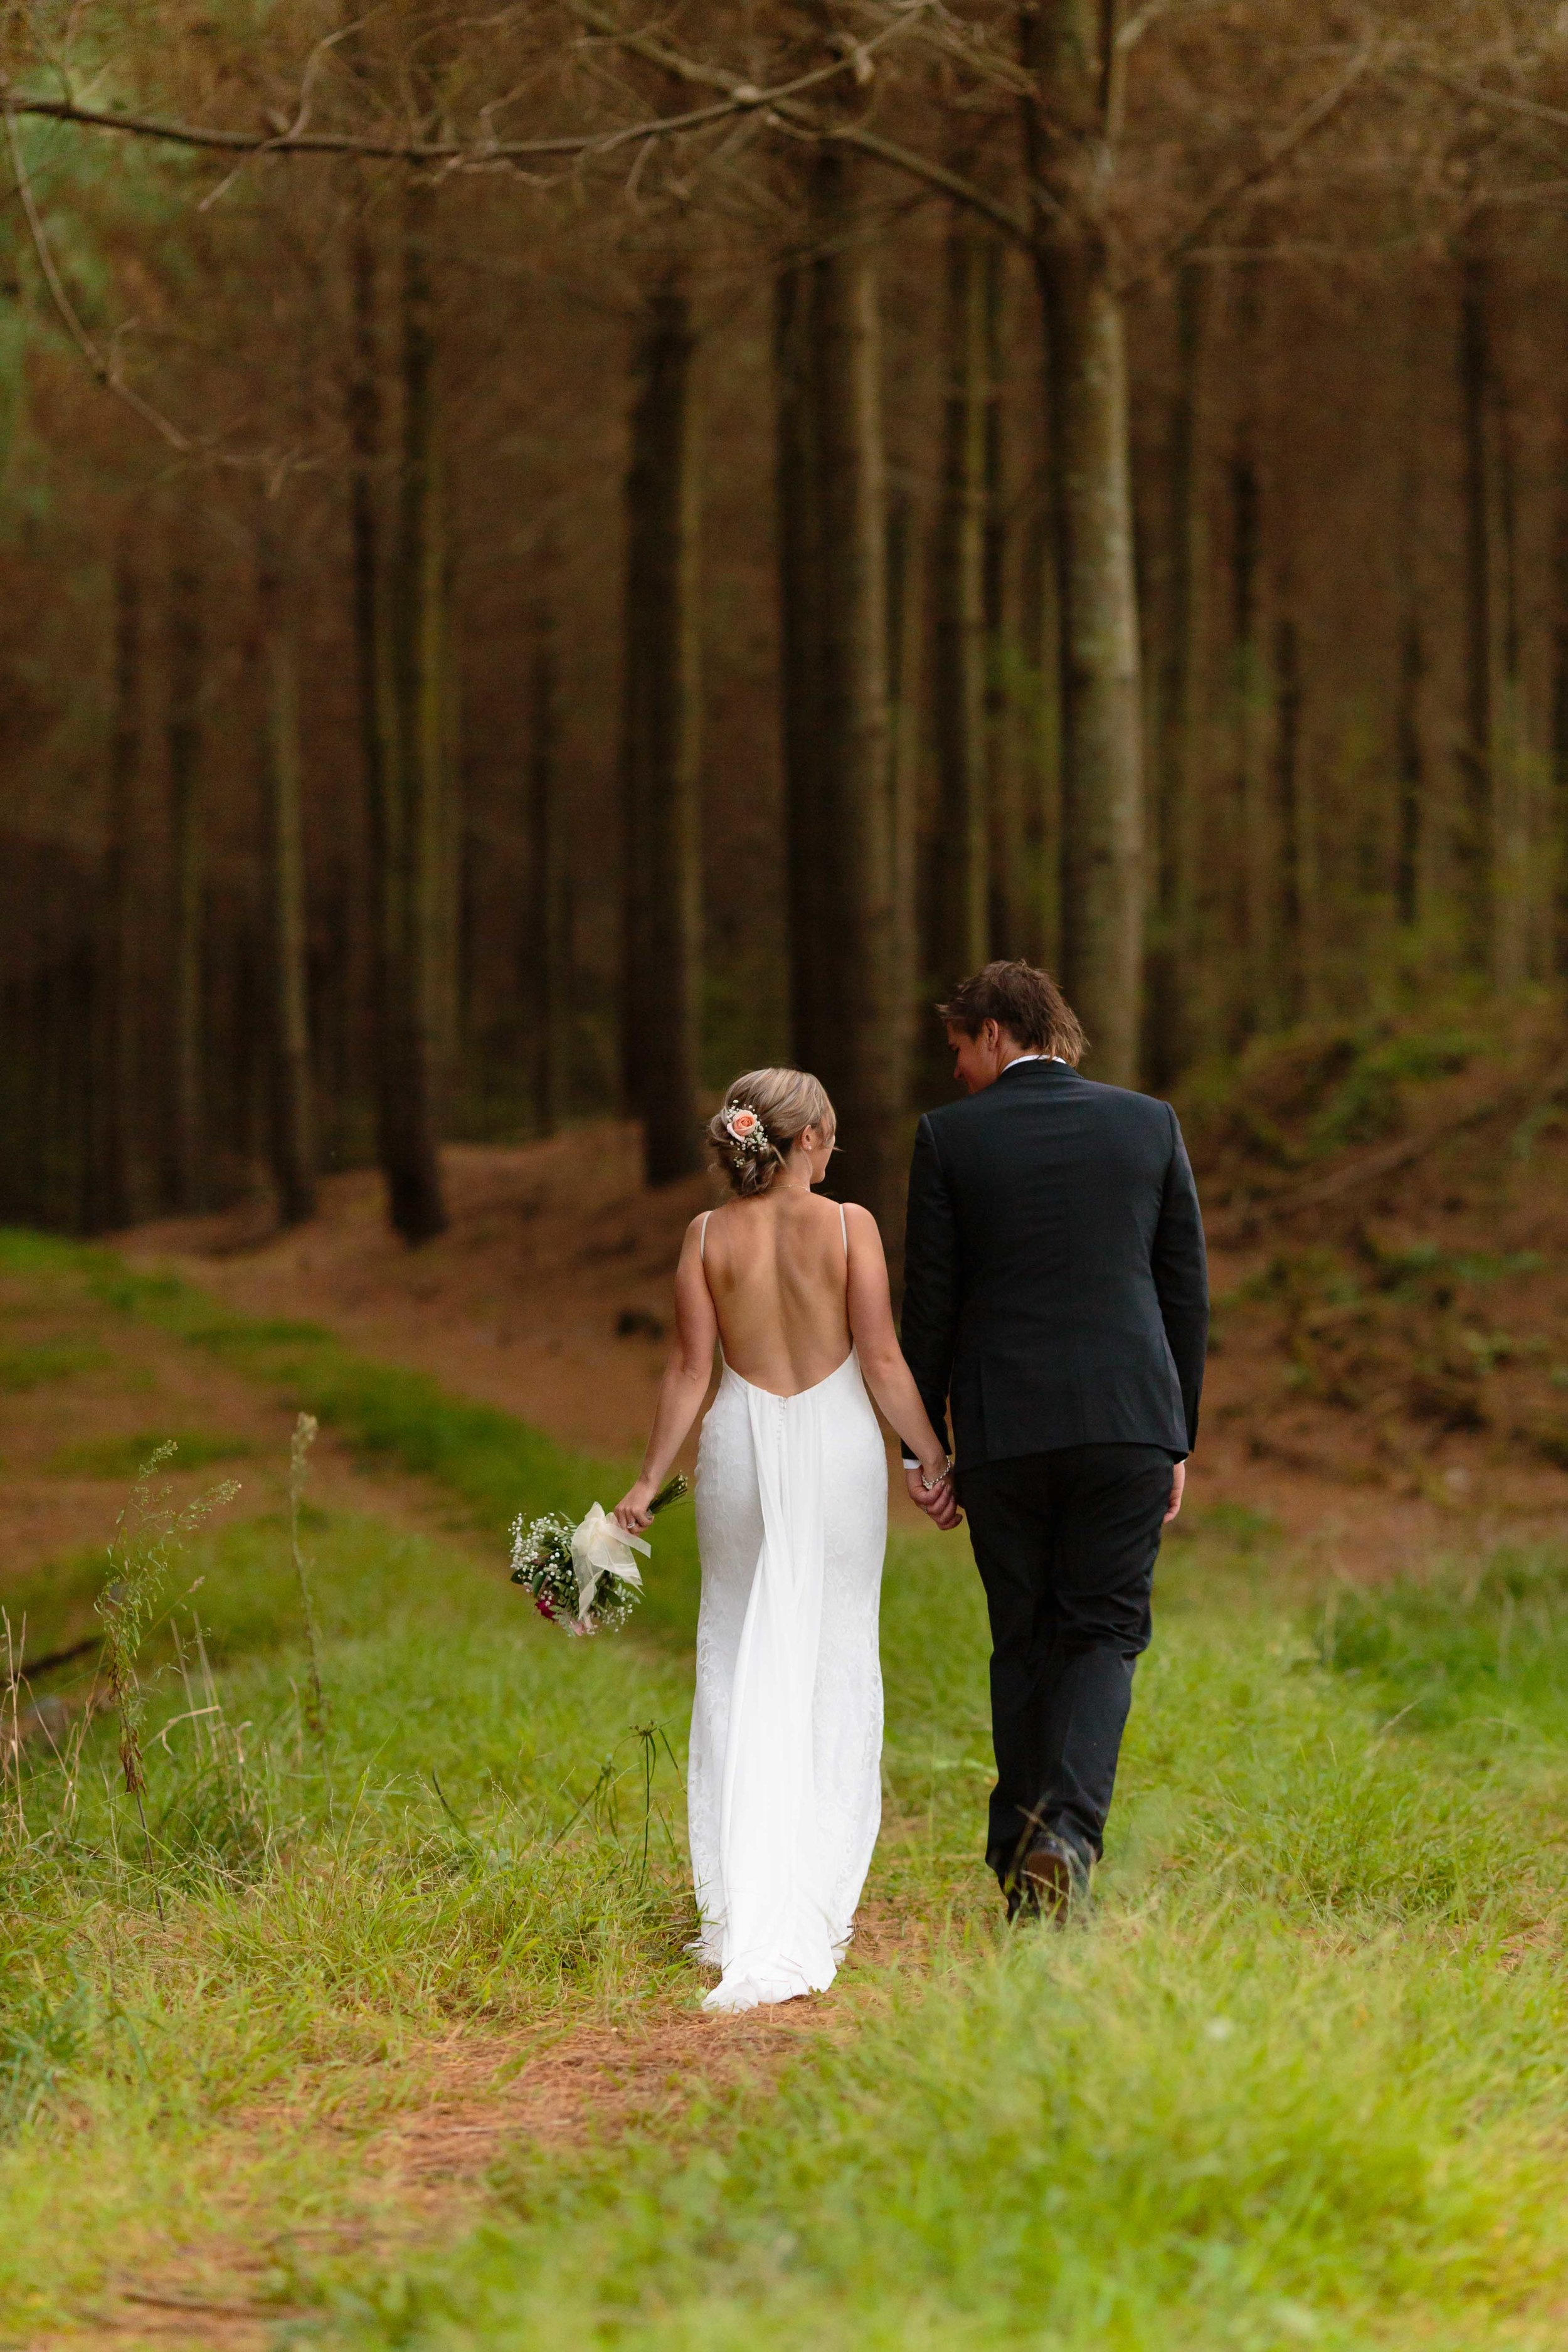 Highight-wedding-photography-dudding-lake-palmerston-north-new-zealand-64.jpg